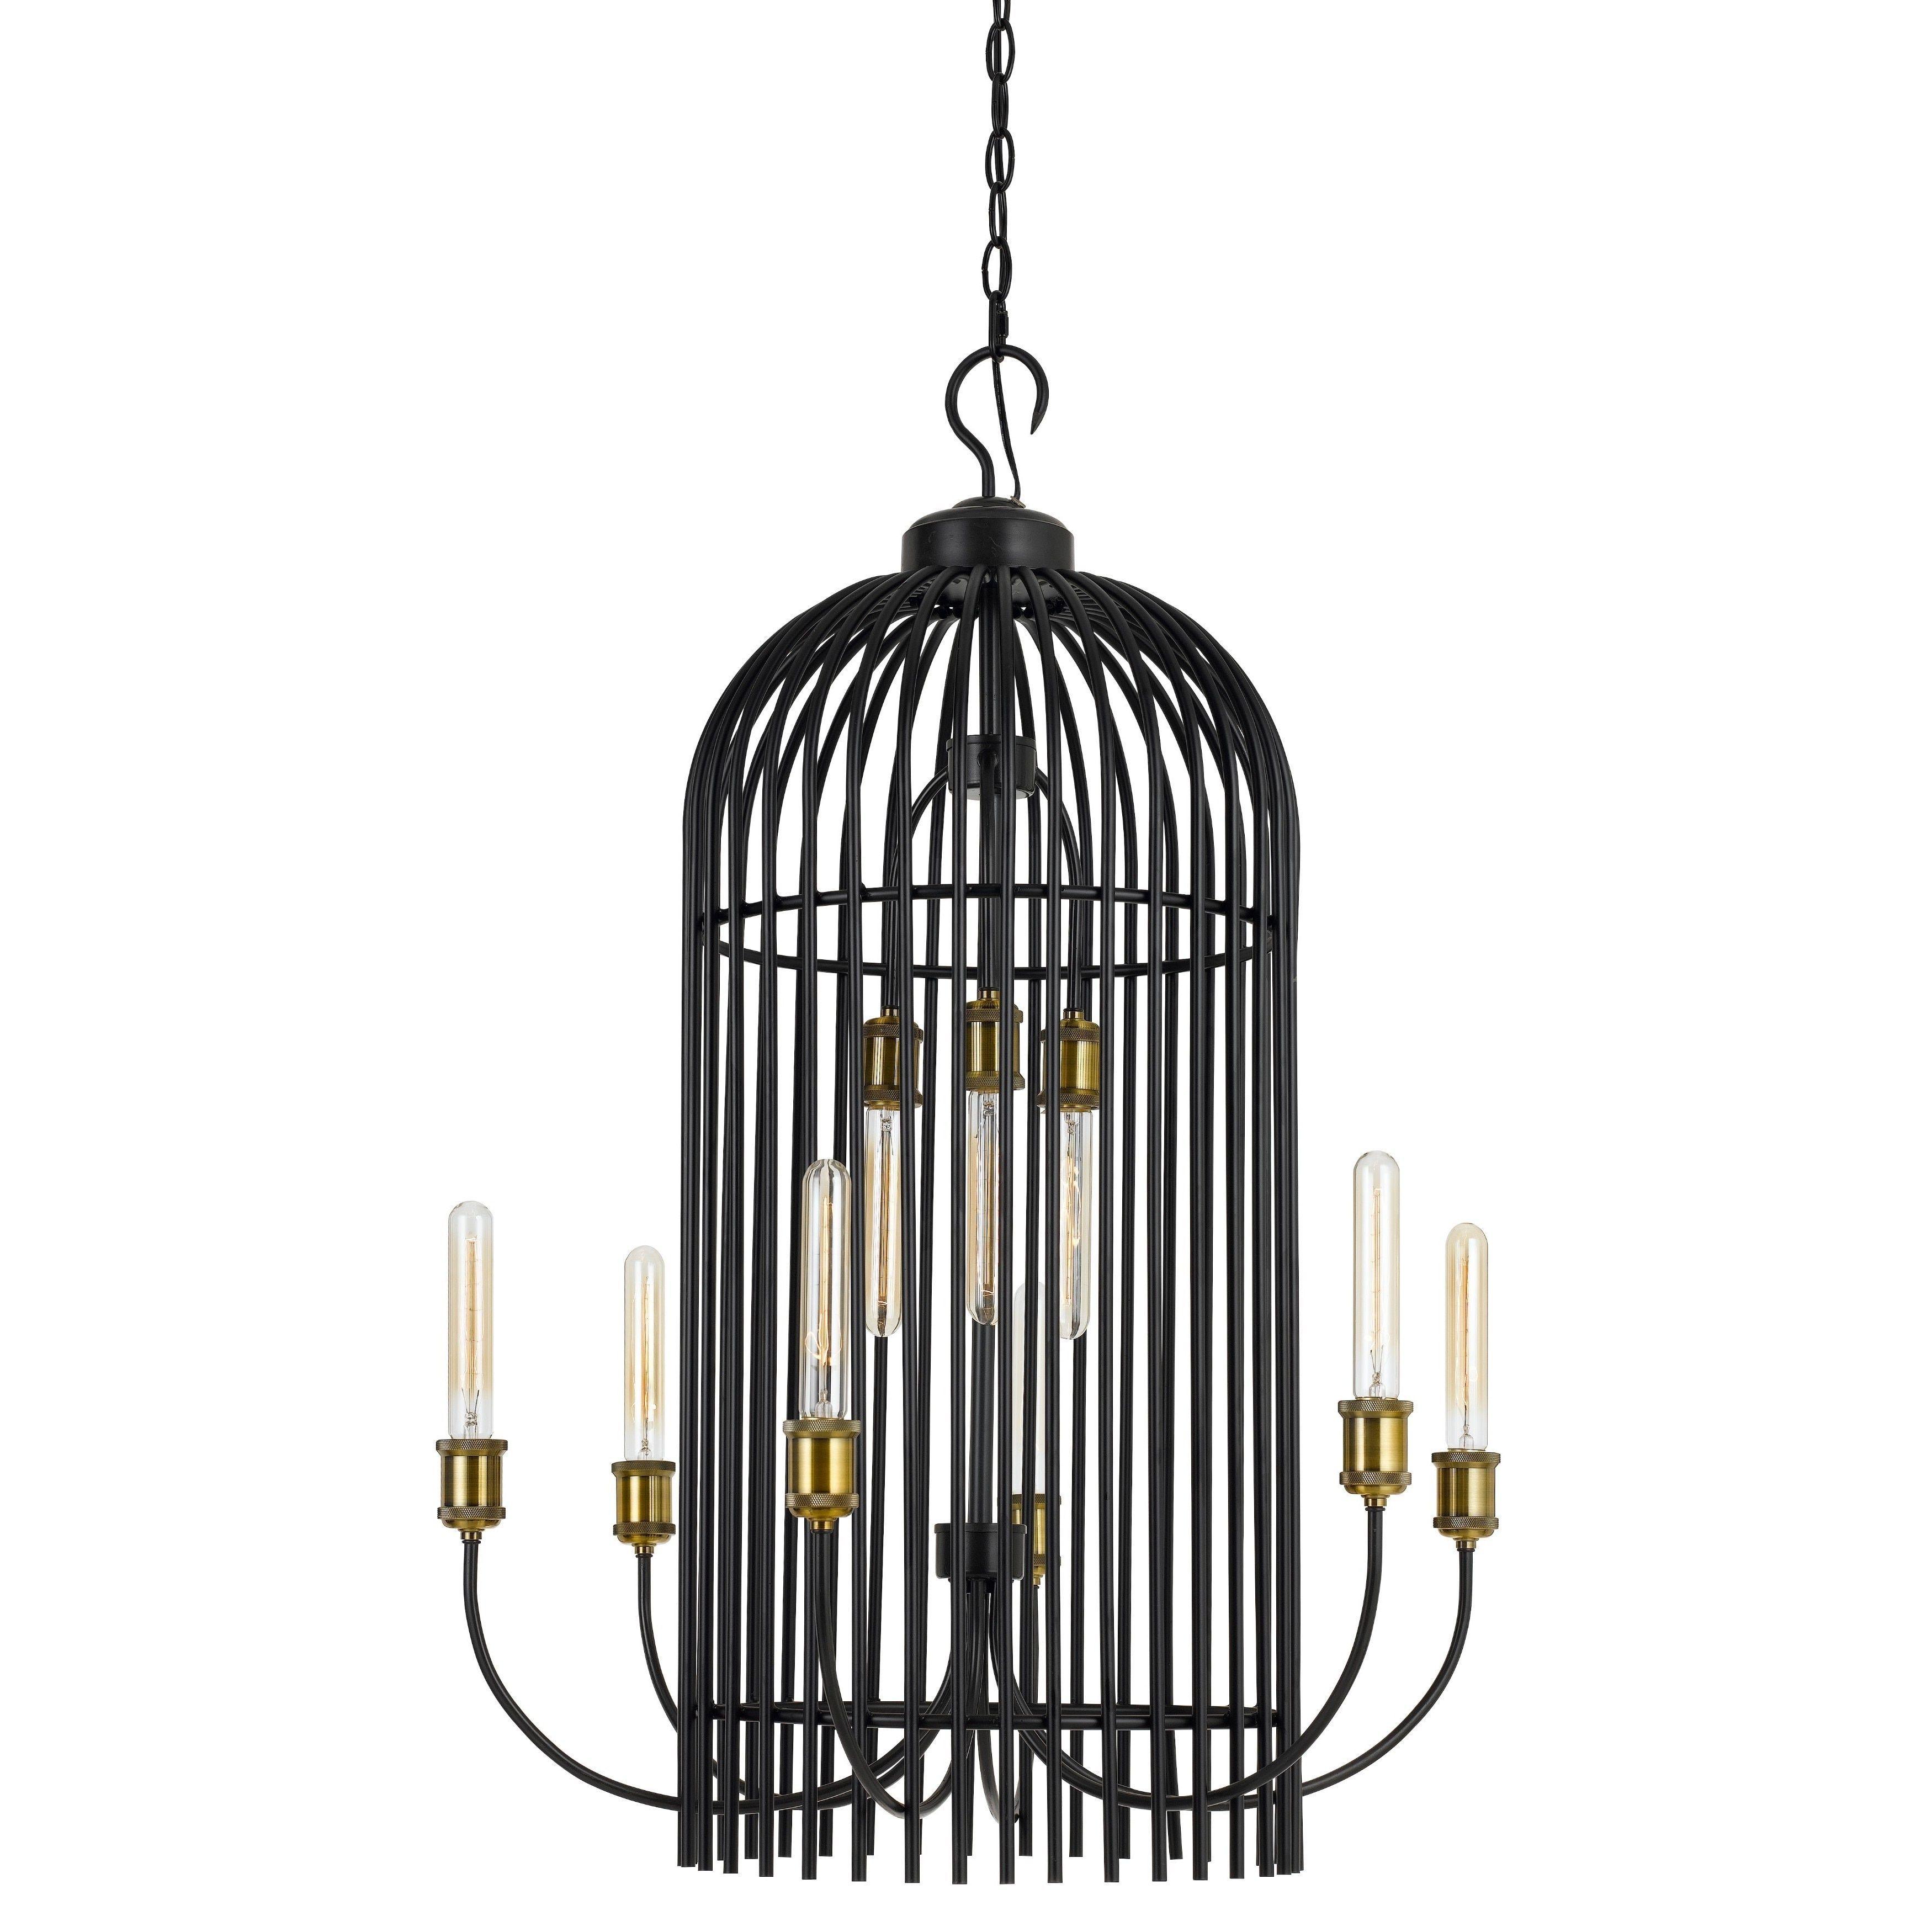 Metal 9 light 60 watt birdcage chandelier chandelier black cal lighting birdcage 9 light 26 wide 2 tier caged chandelier with bl black arubaitofo Image collections